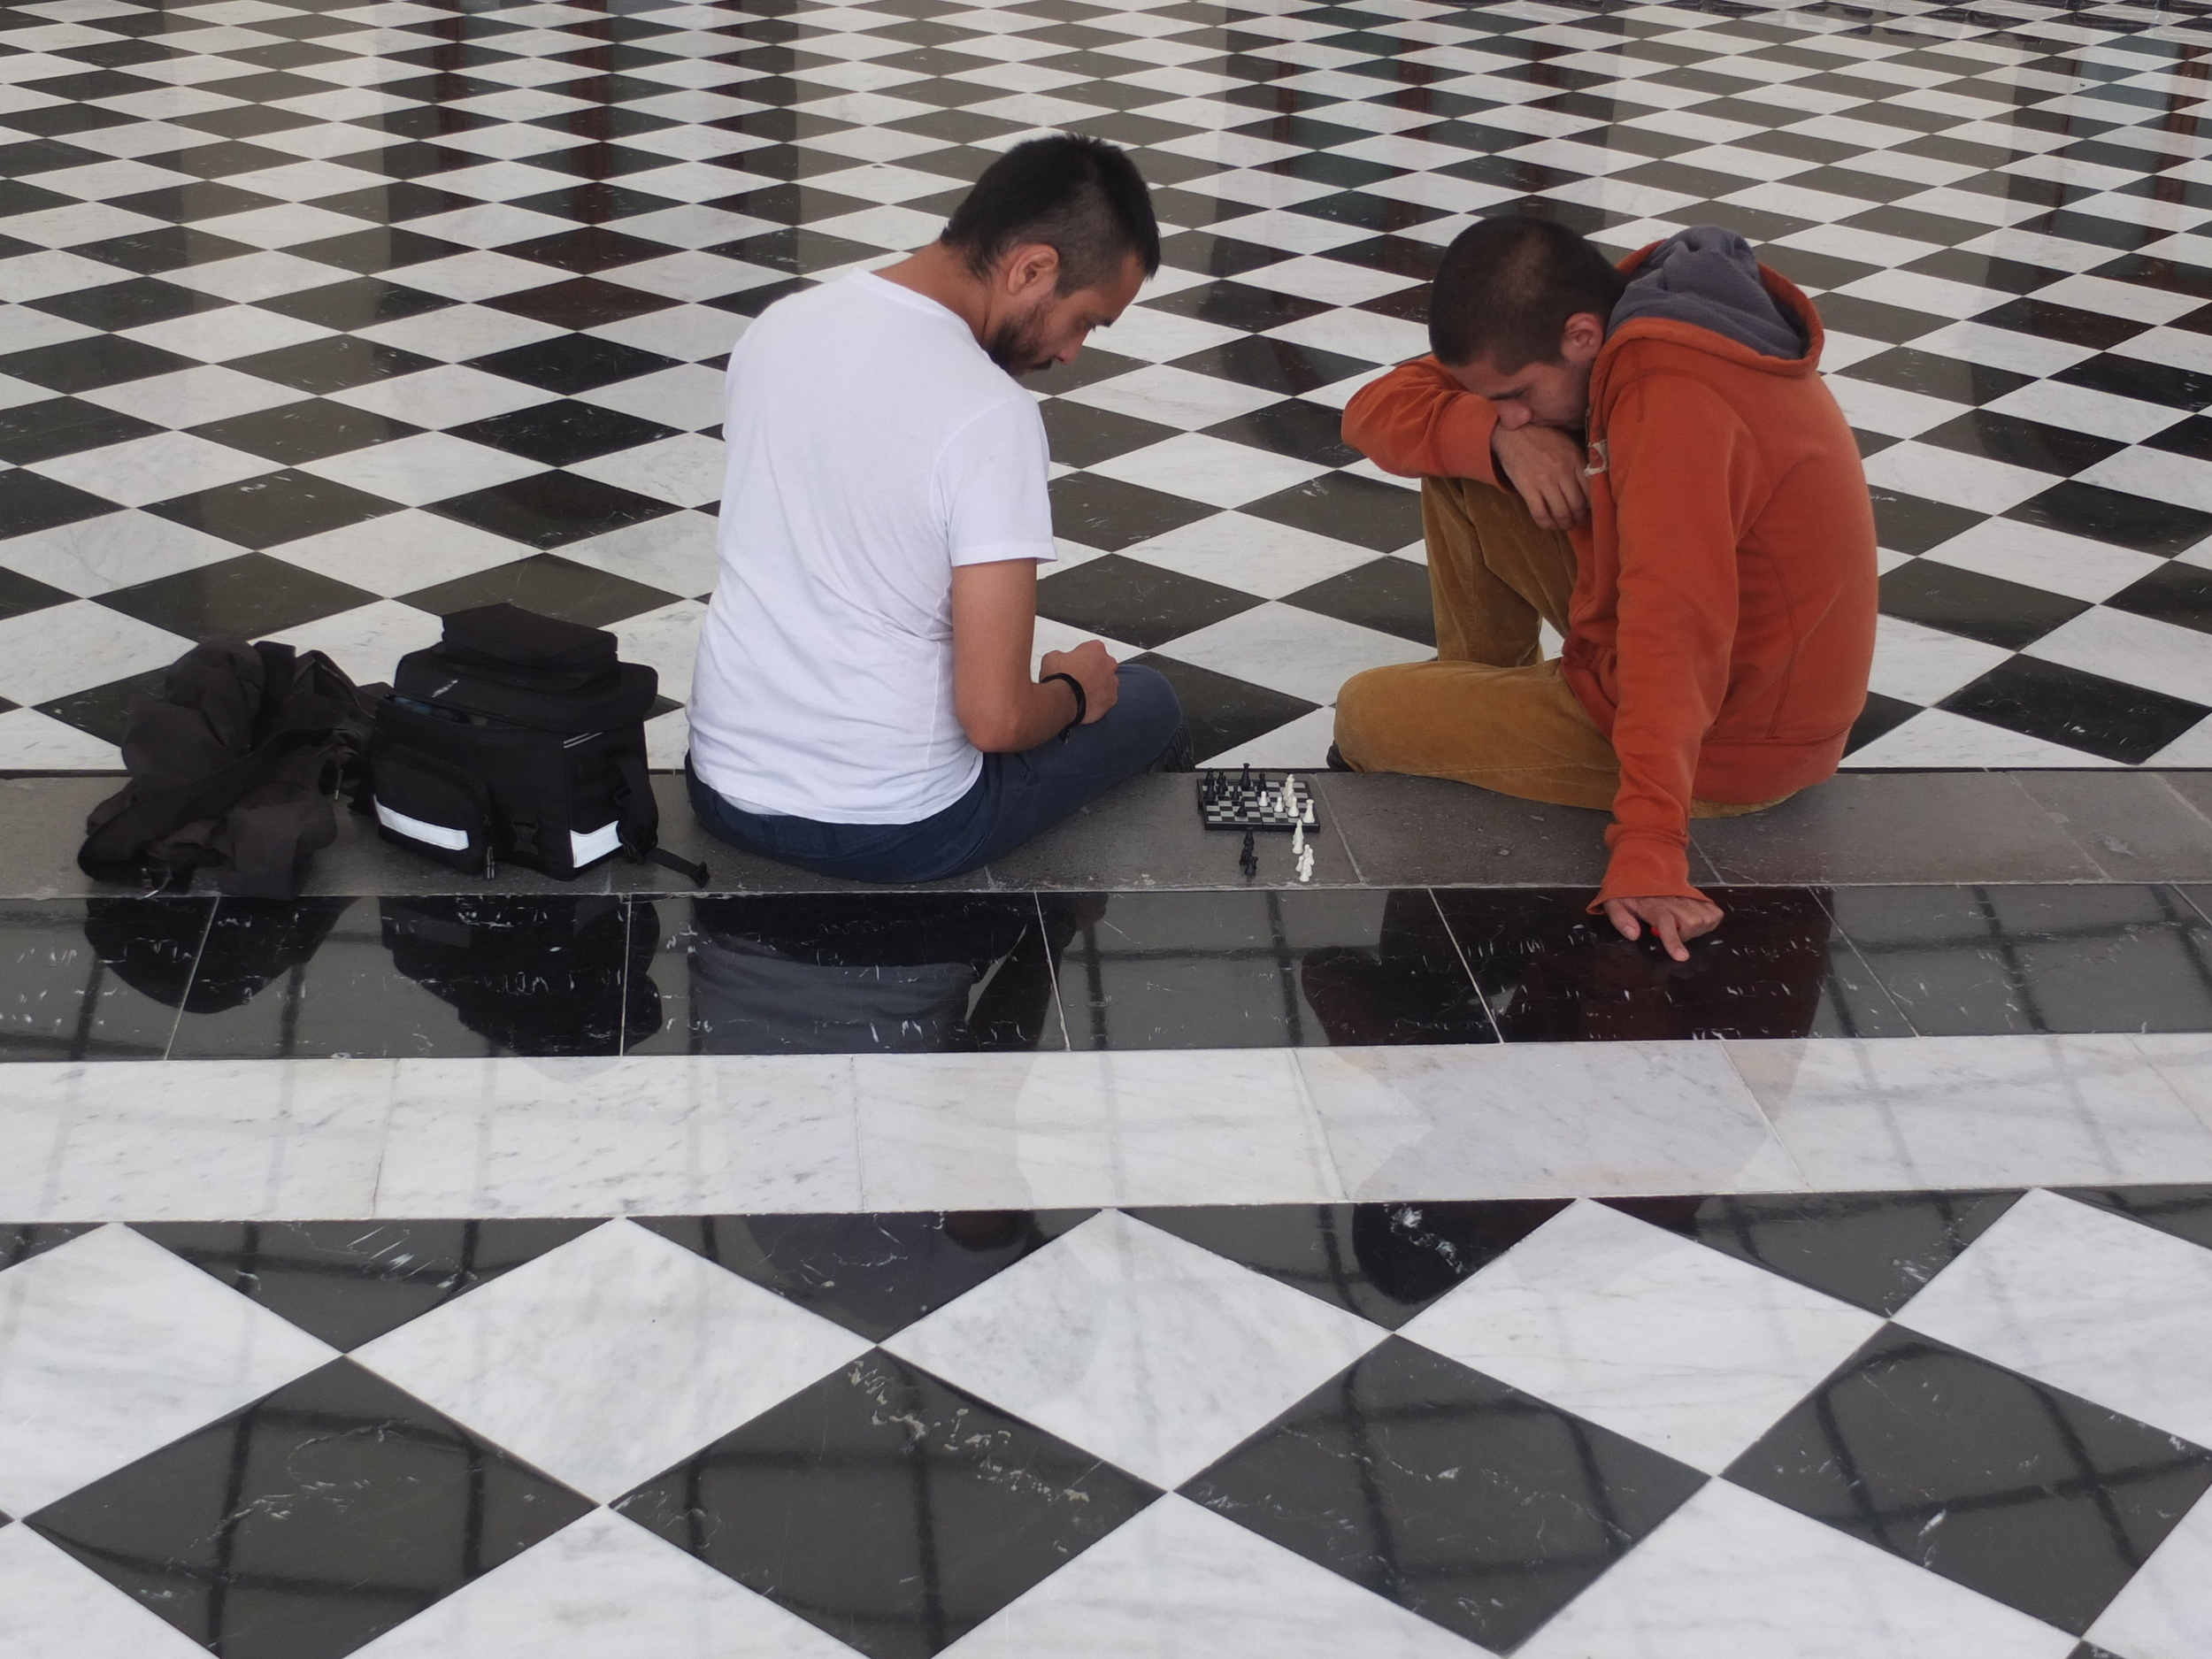 Chess  Mexico City, Mexico  8/2012